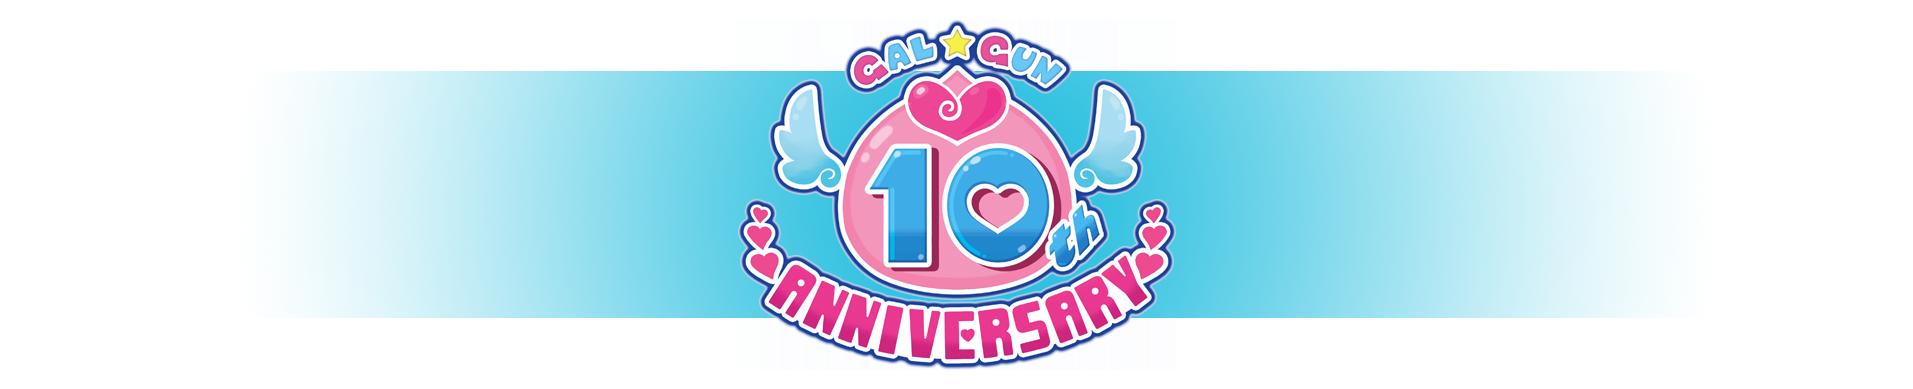 Gal Gun 10th Anniversary Badge